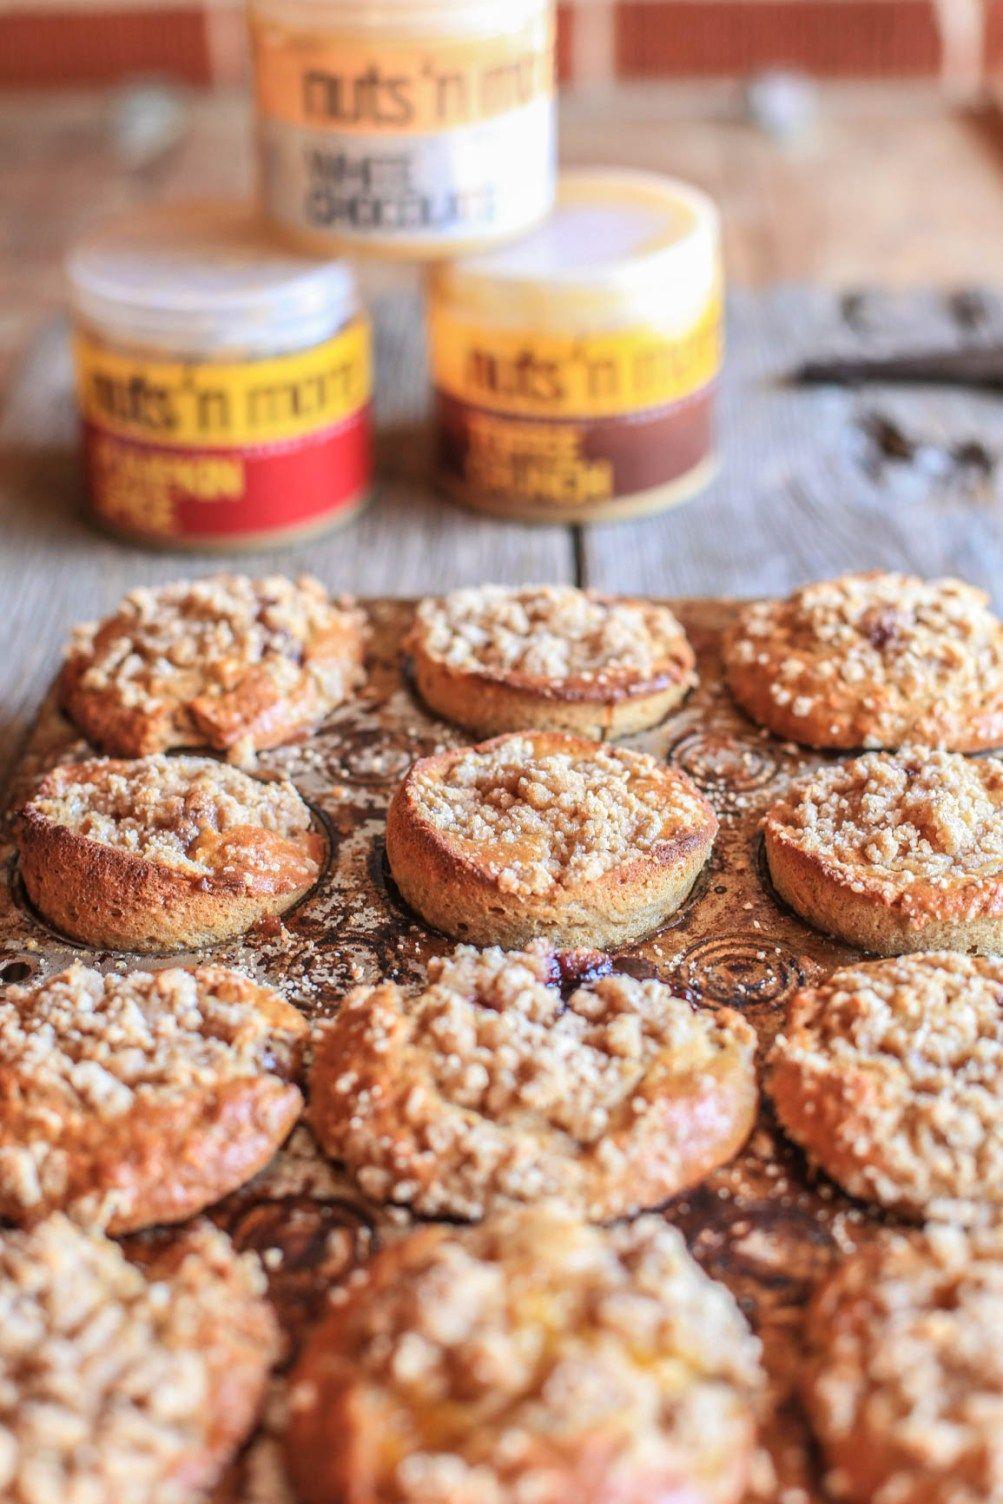 Peanut Butter & Jelly Crumb Muffins – Thegetfitgirlmiranda